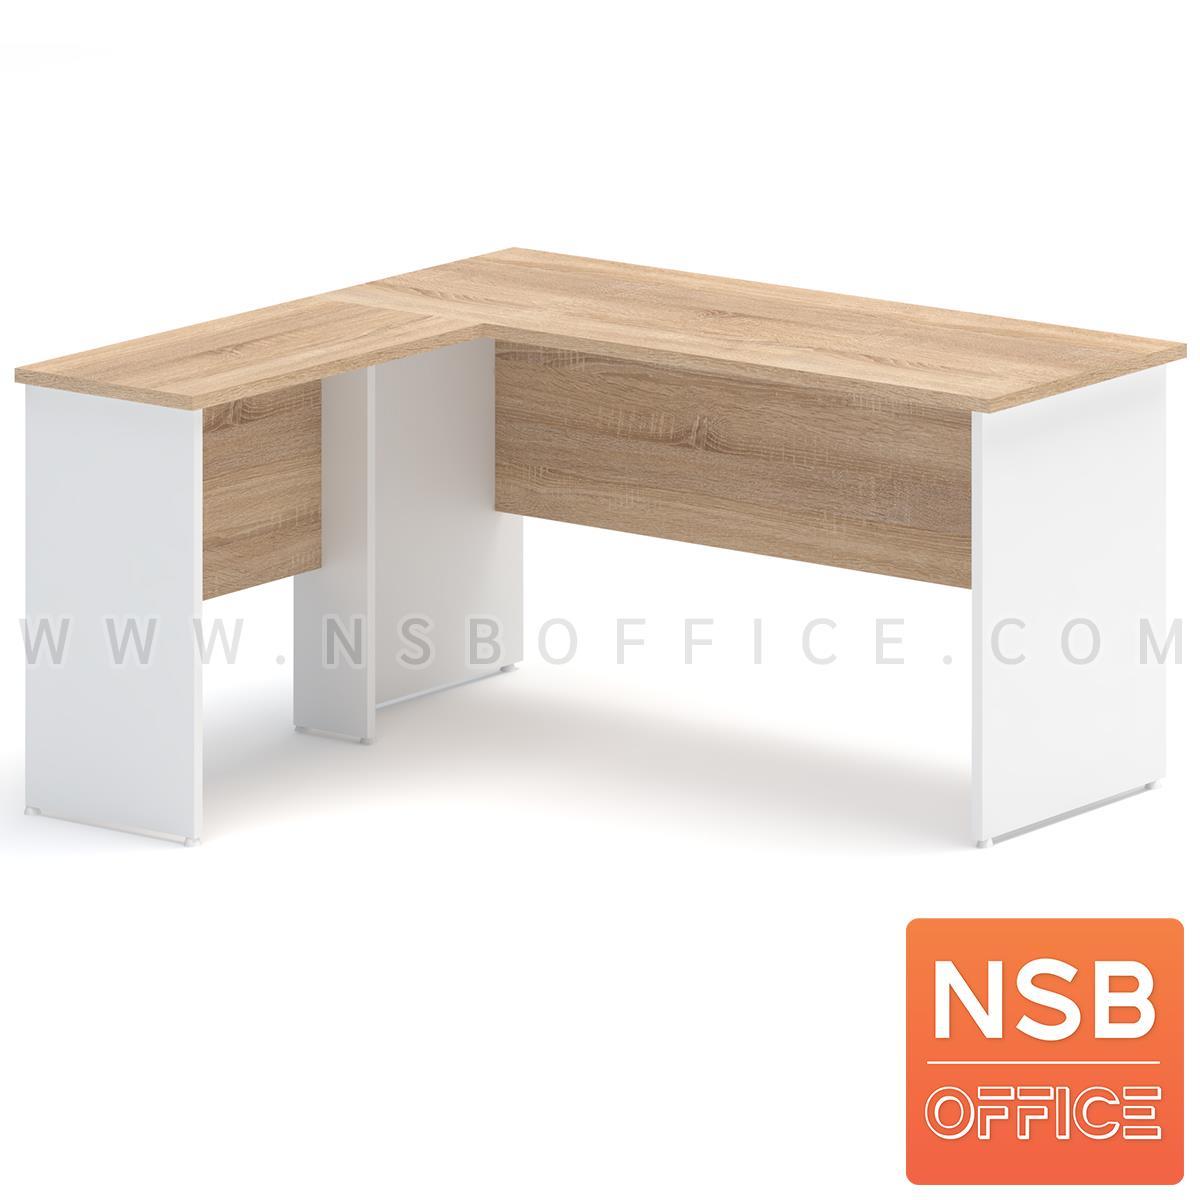 A21A017:โต๊ะทำงานทรงตัวแอล  รุ่น SR-N15 ขนาด 150W cm. เมลามีน สีเนเจอร์ทีค-ขาว